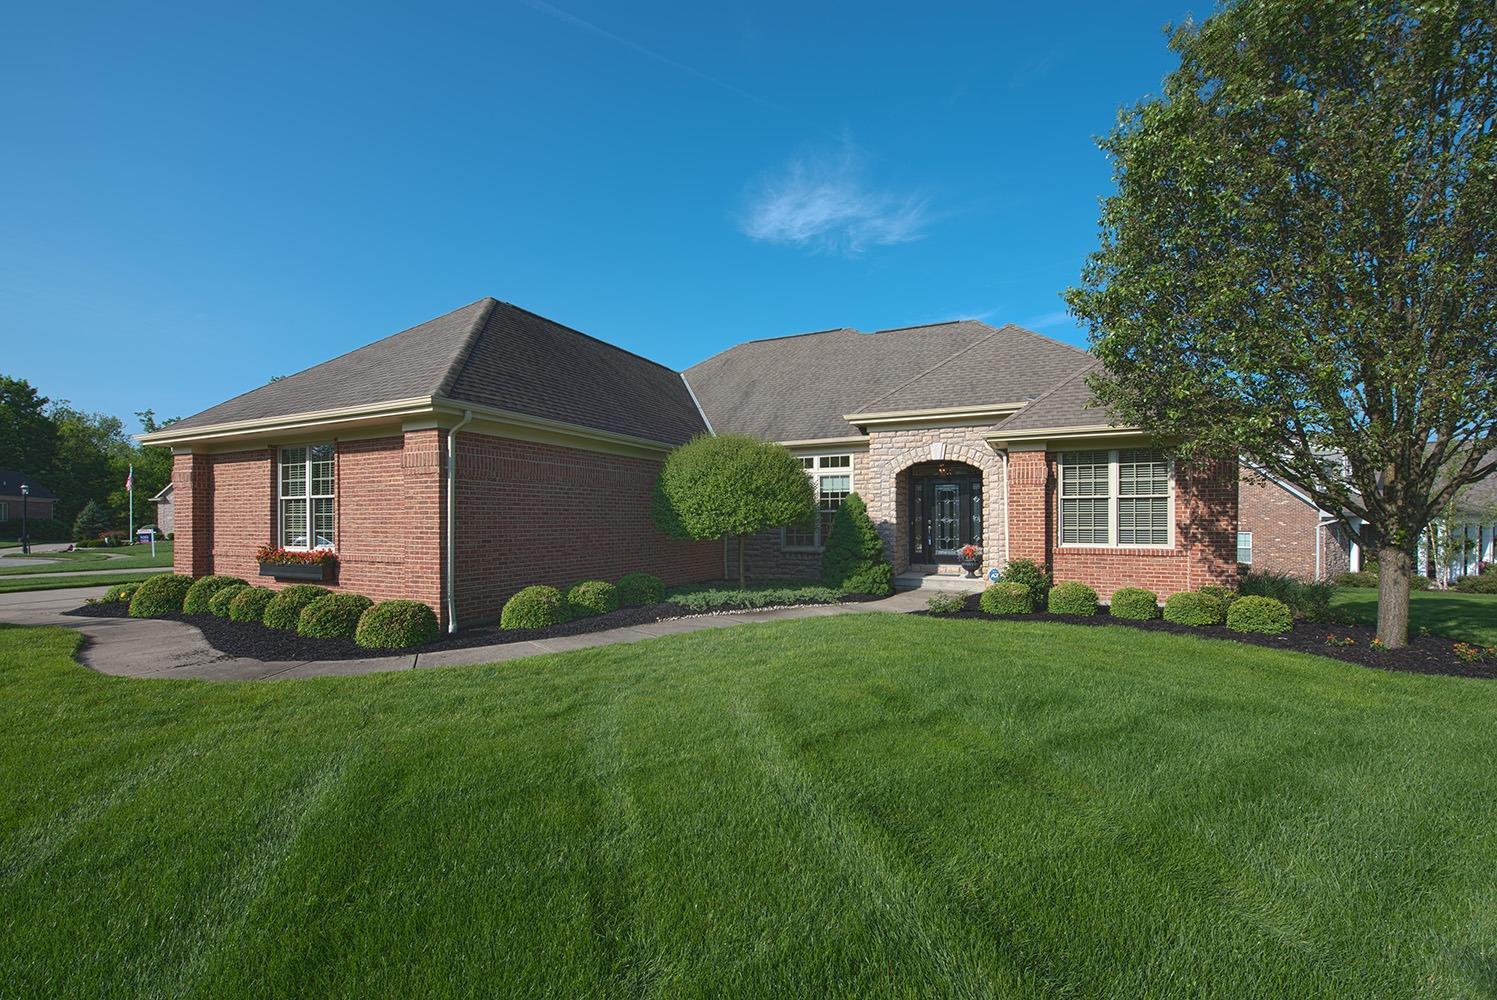 Property for sale at 4489 Ravenwood Court, Union Twp,  Ohio 45244